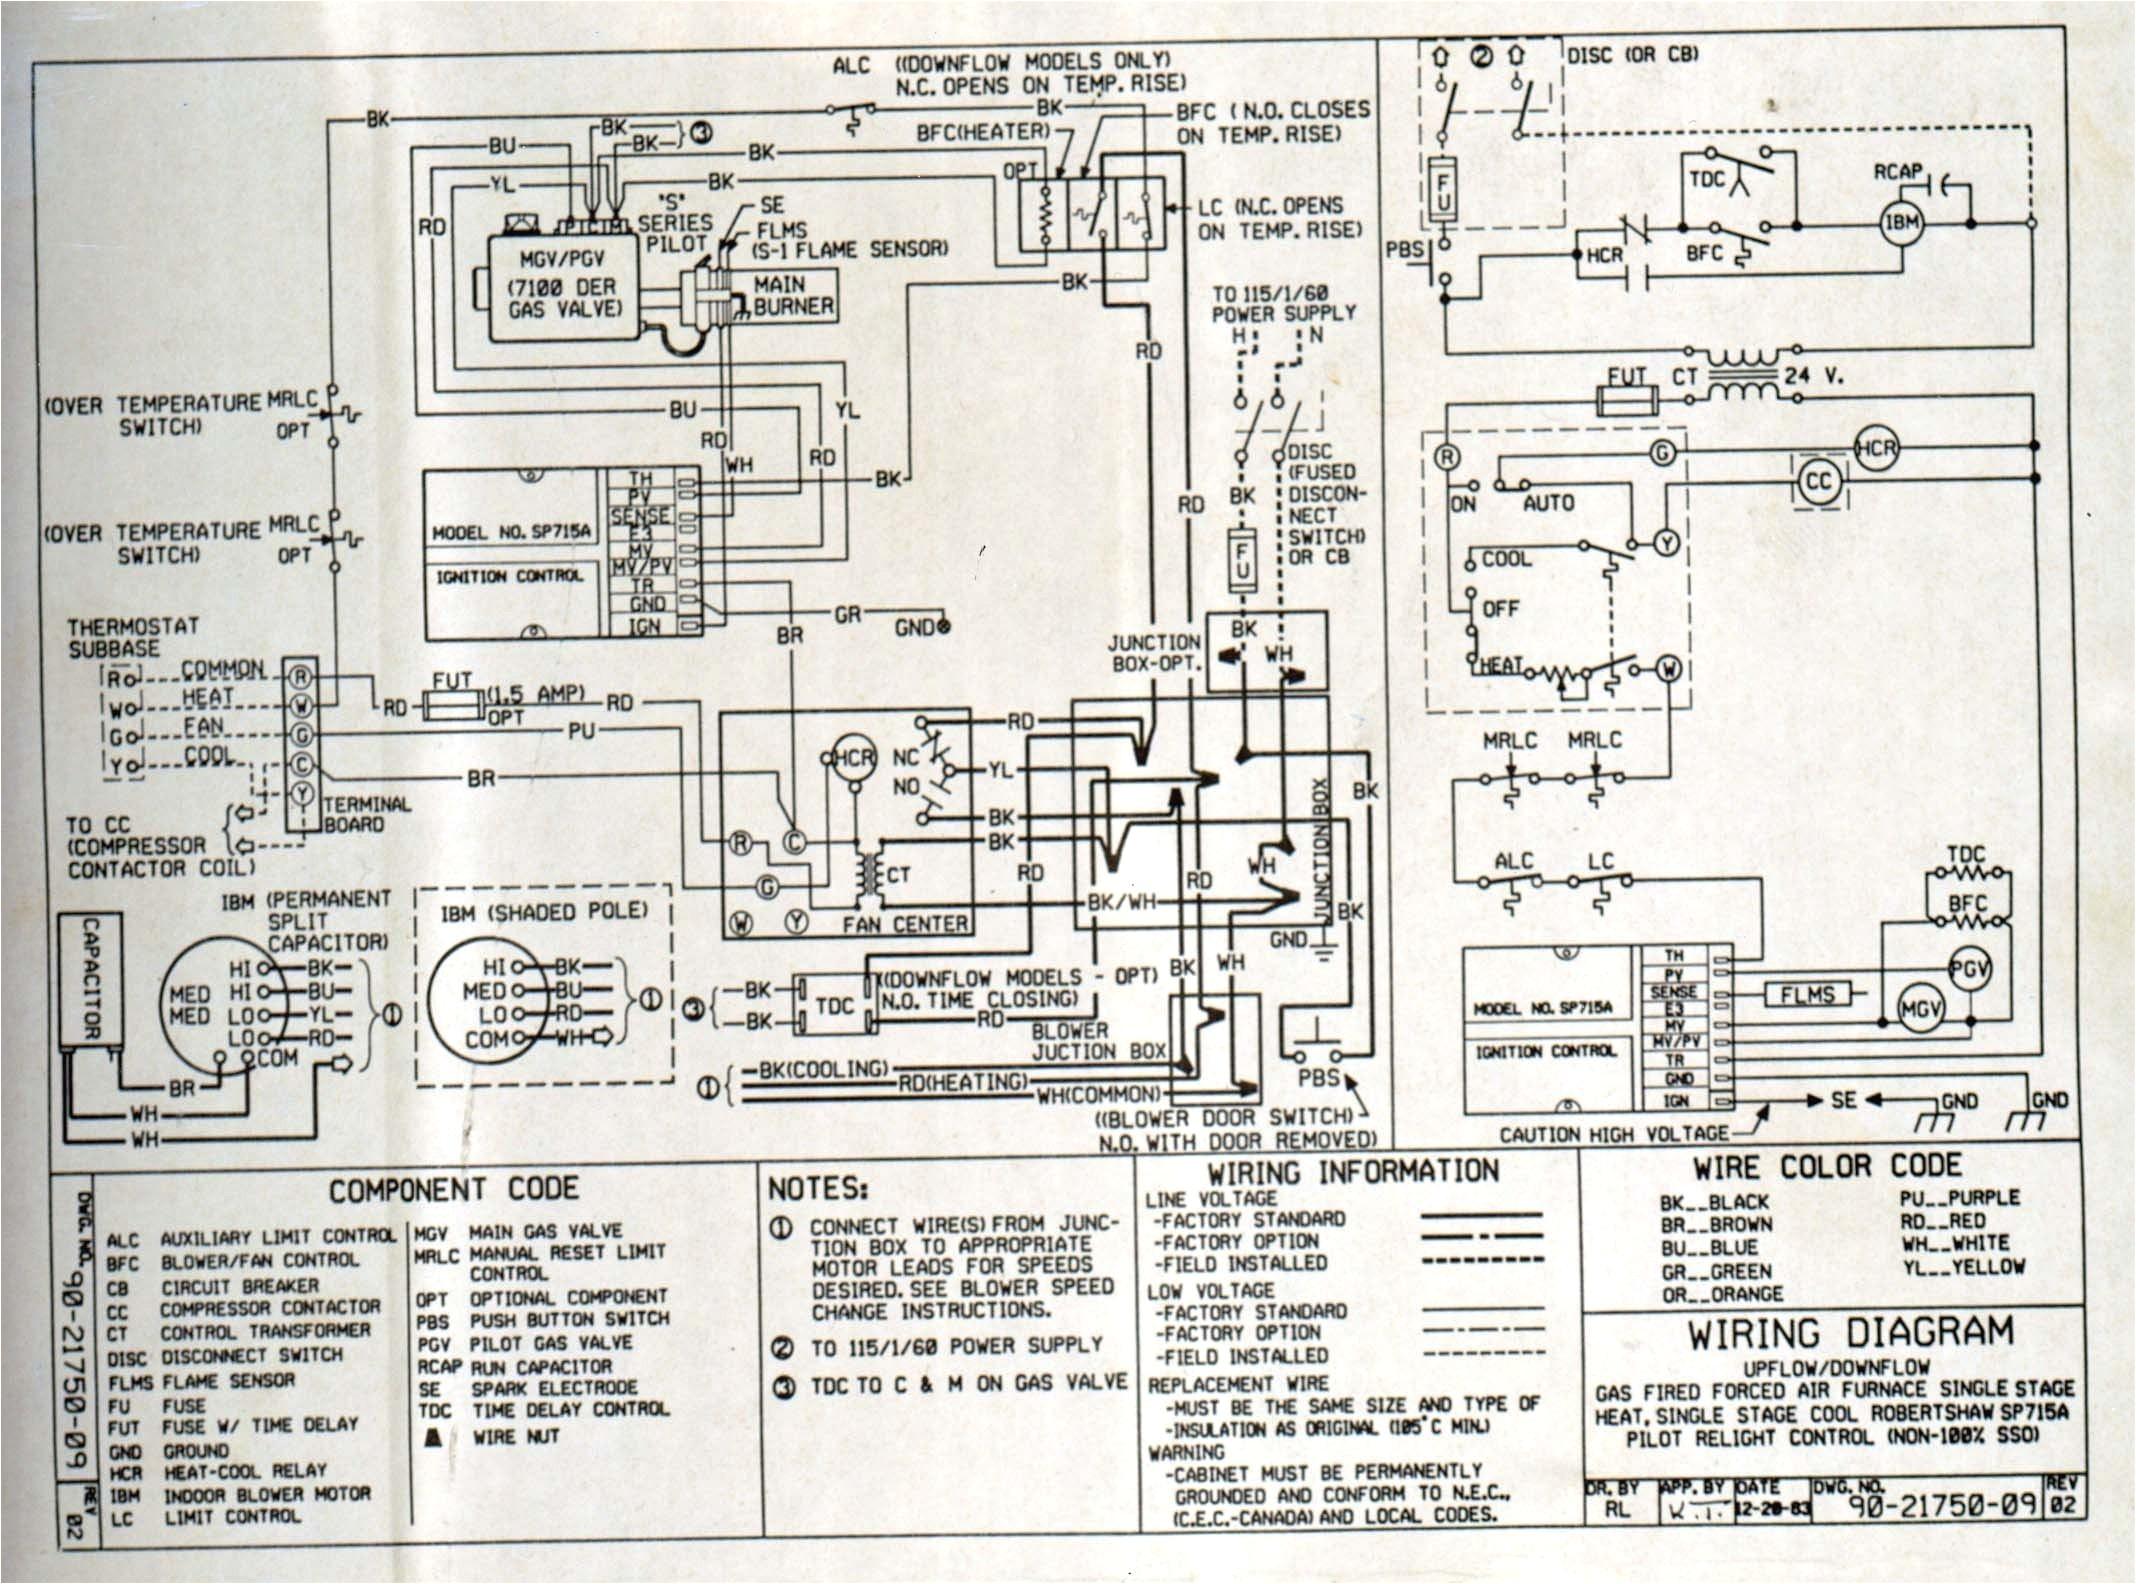 furnace wiring diagram wiring diagram schemes american standard high efficiency furnace schematic american standard furnace schematic